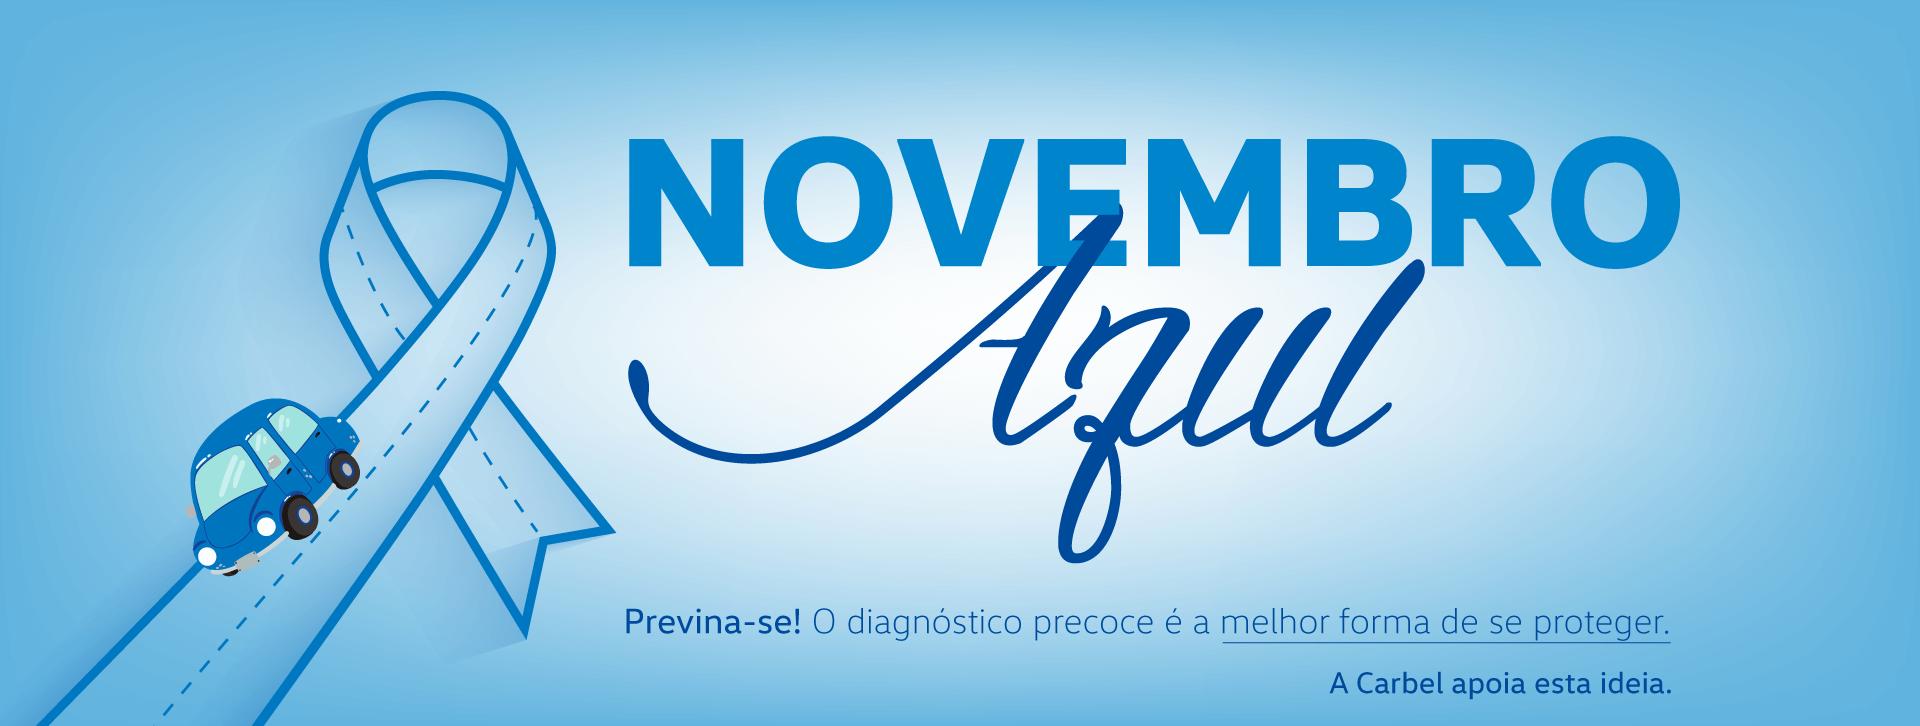 imagem-Banner Novembro Azul